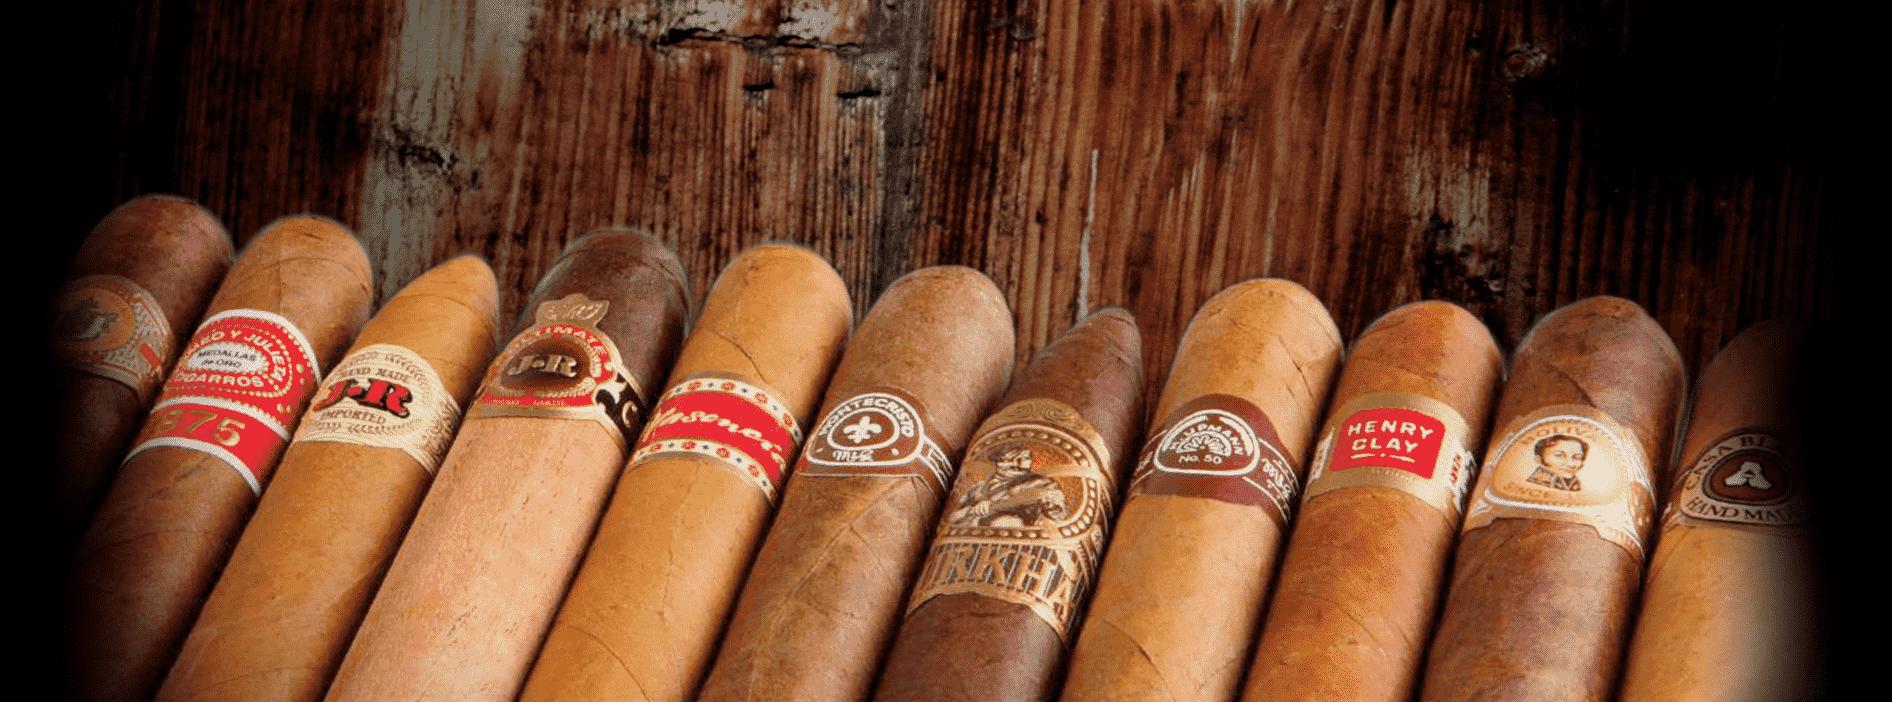 cigars-bgd